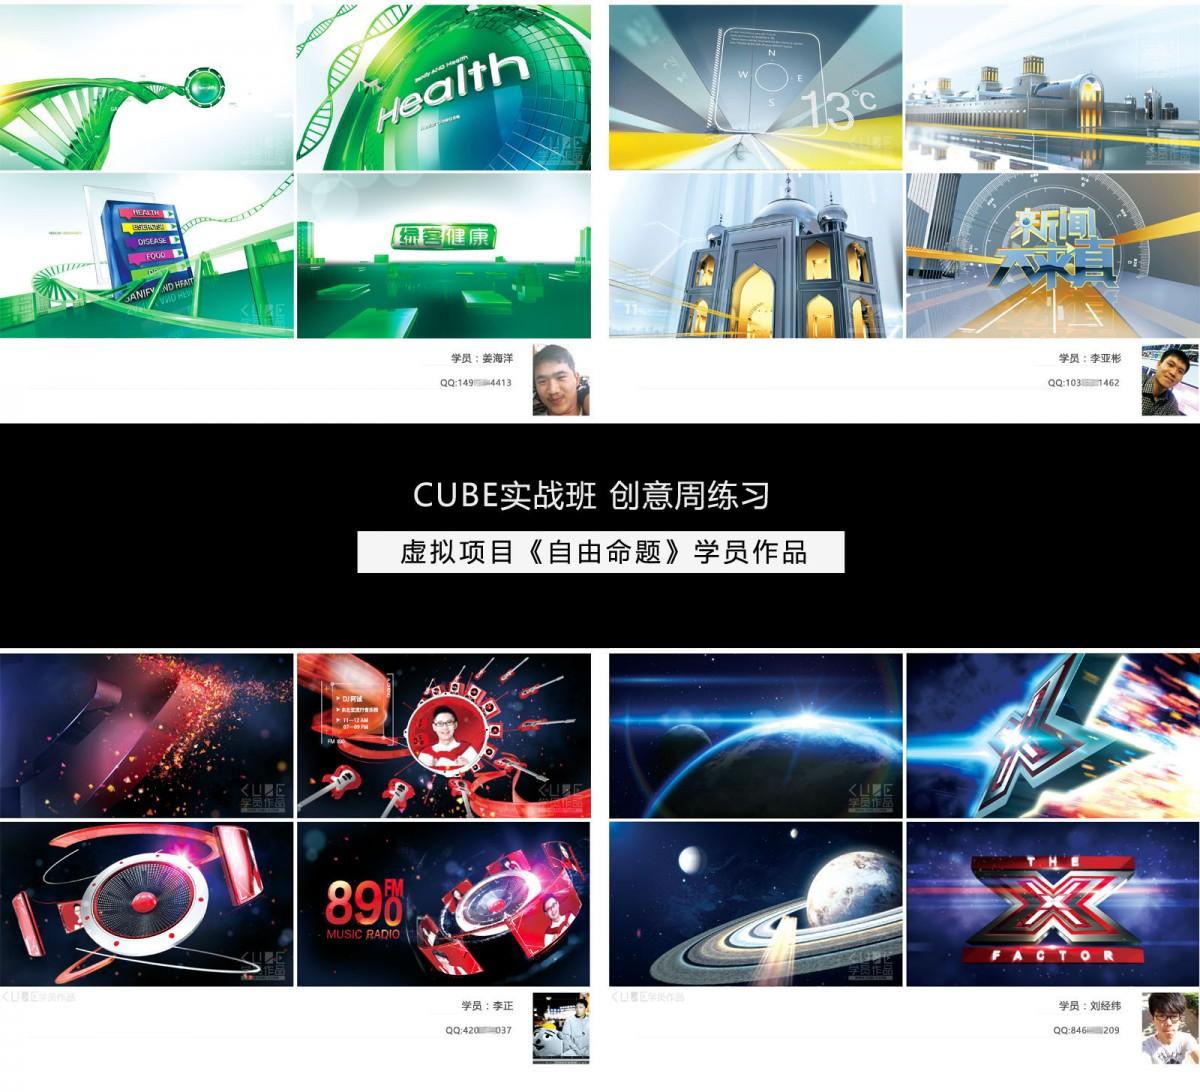 CUBE实战班 创意周——《自由命题》 虚拟项目练习